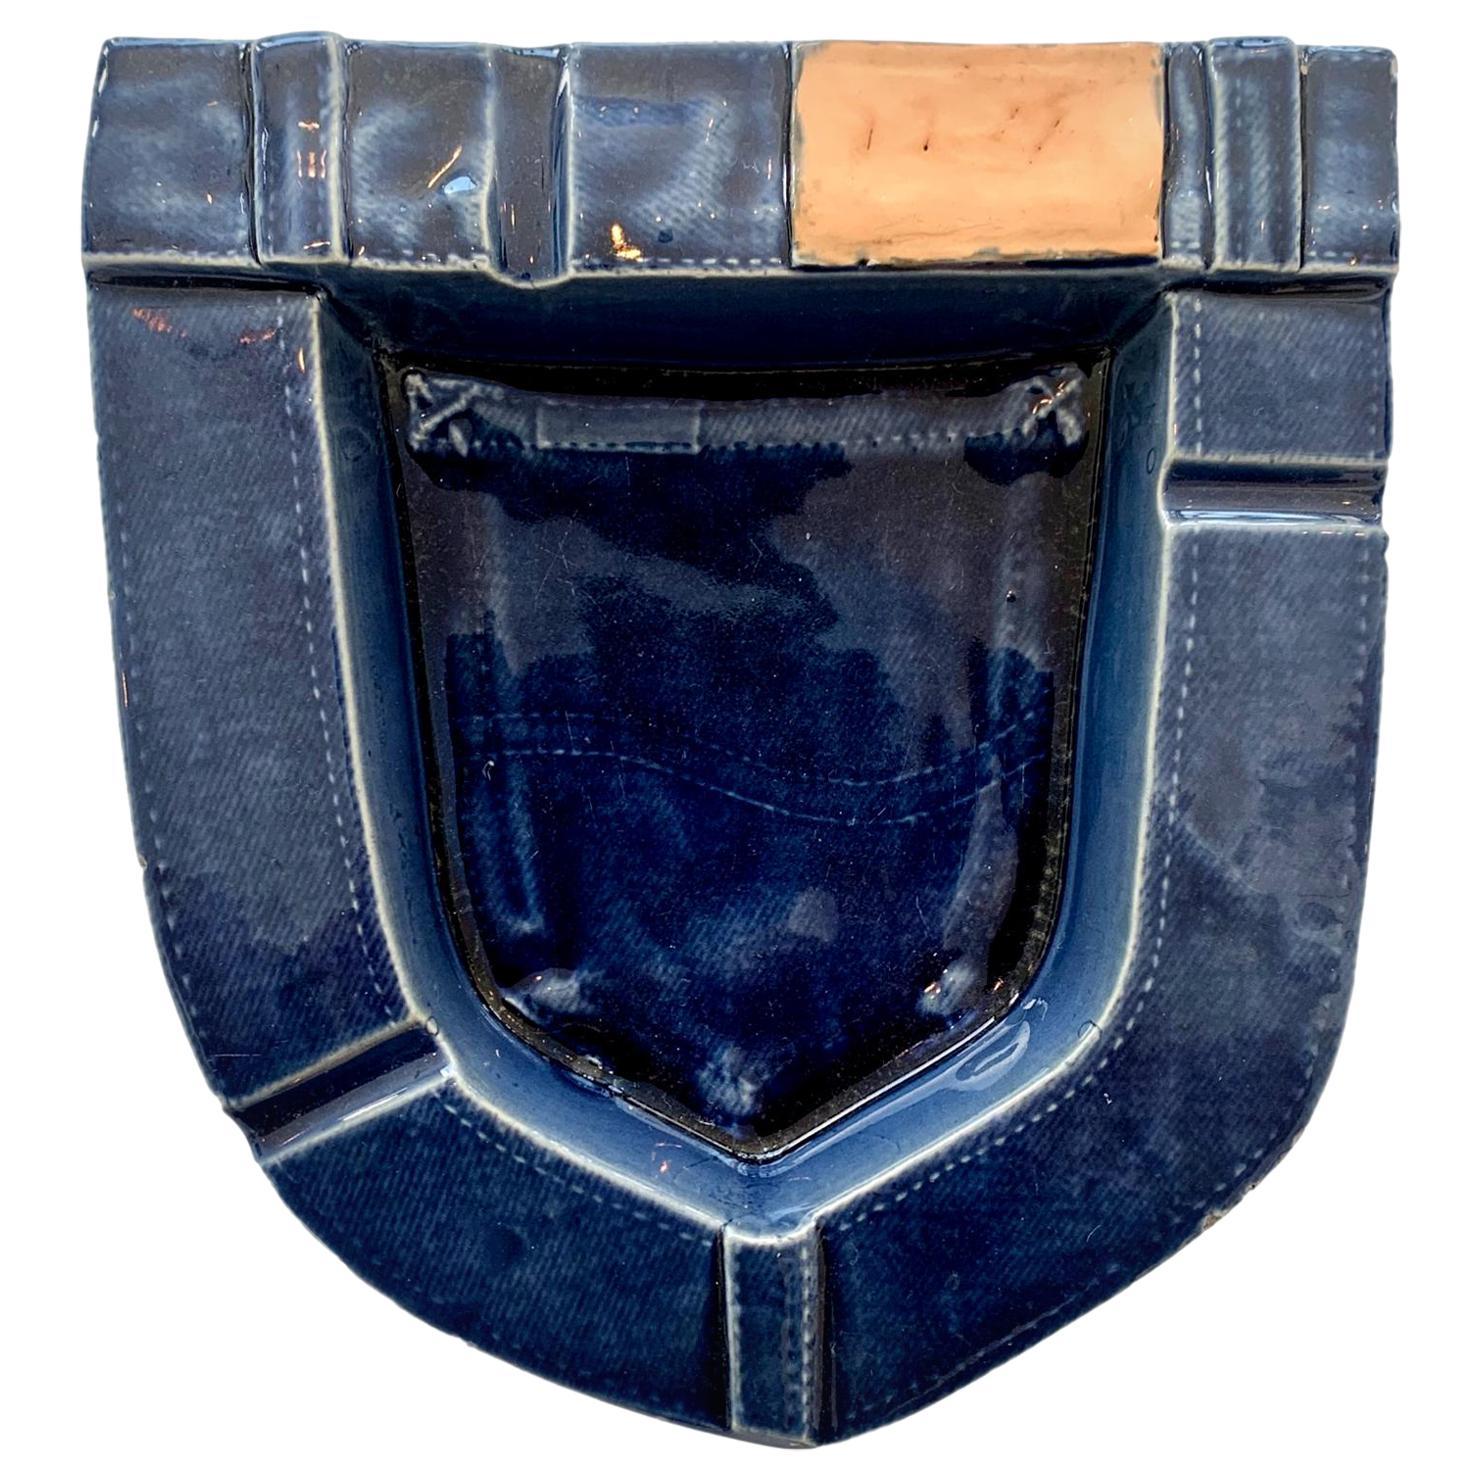 Ceramic Denim Pocket Catchall